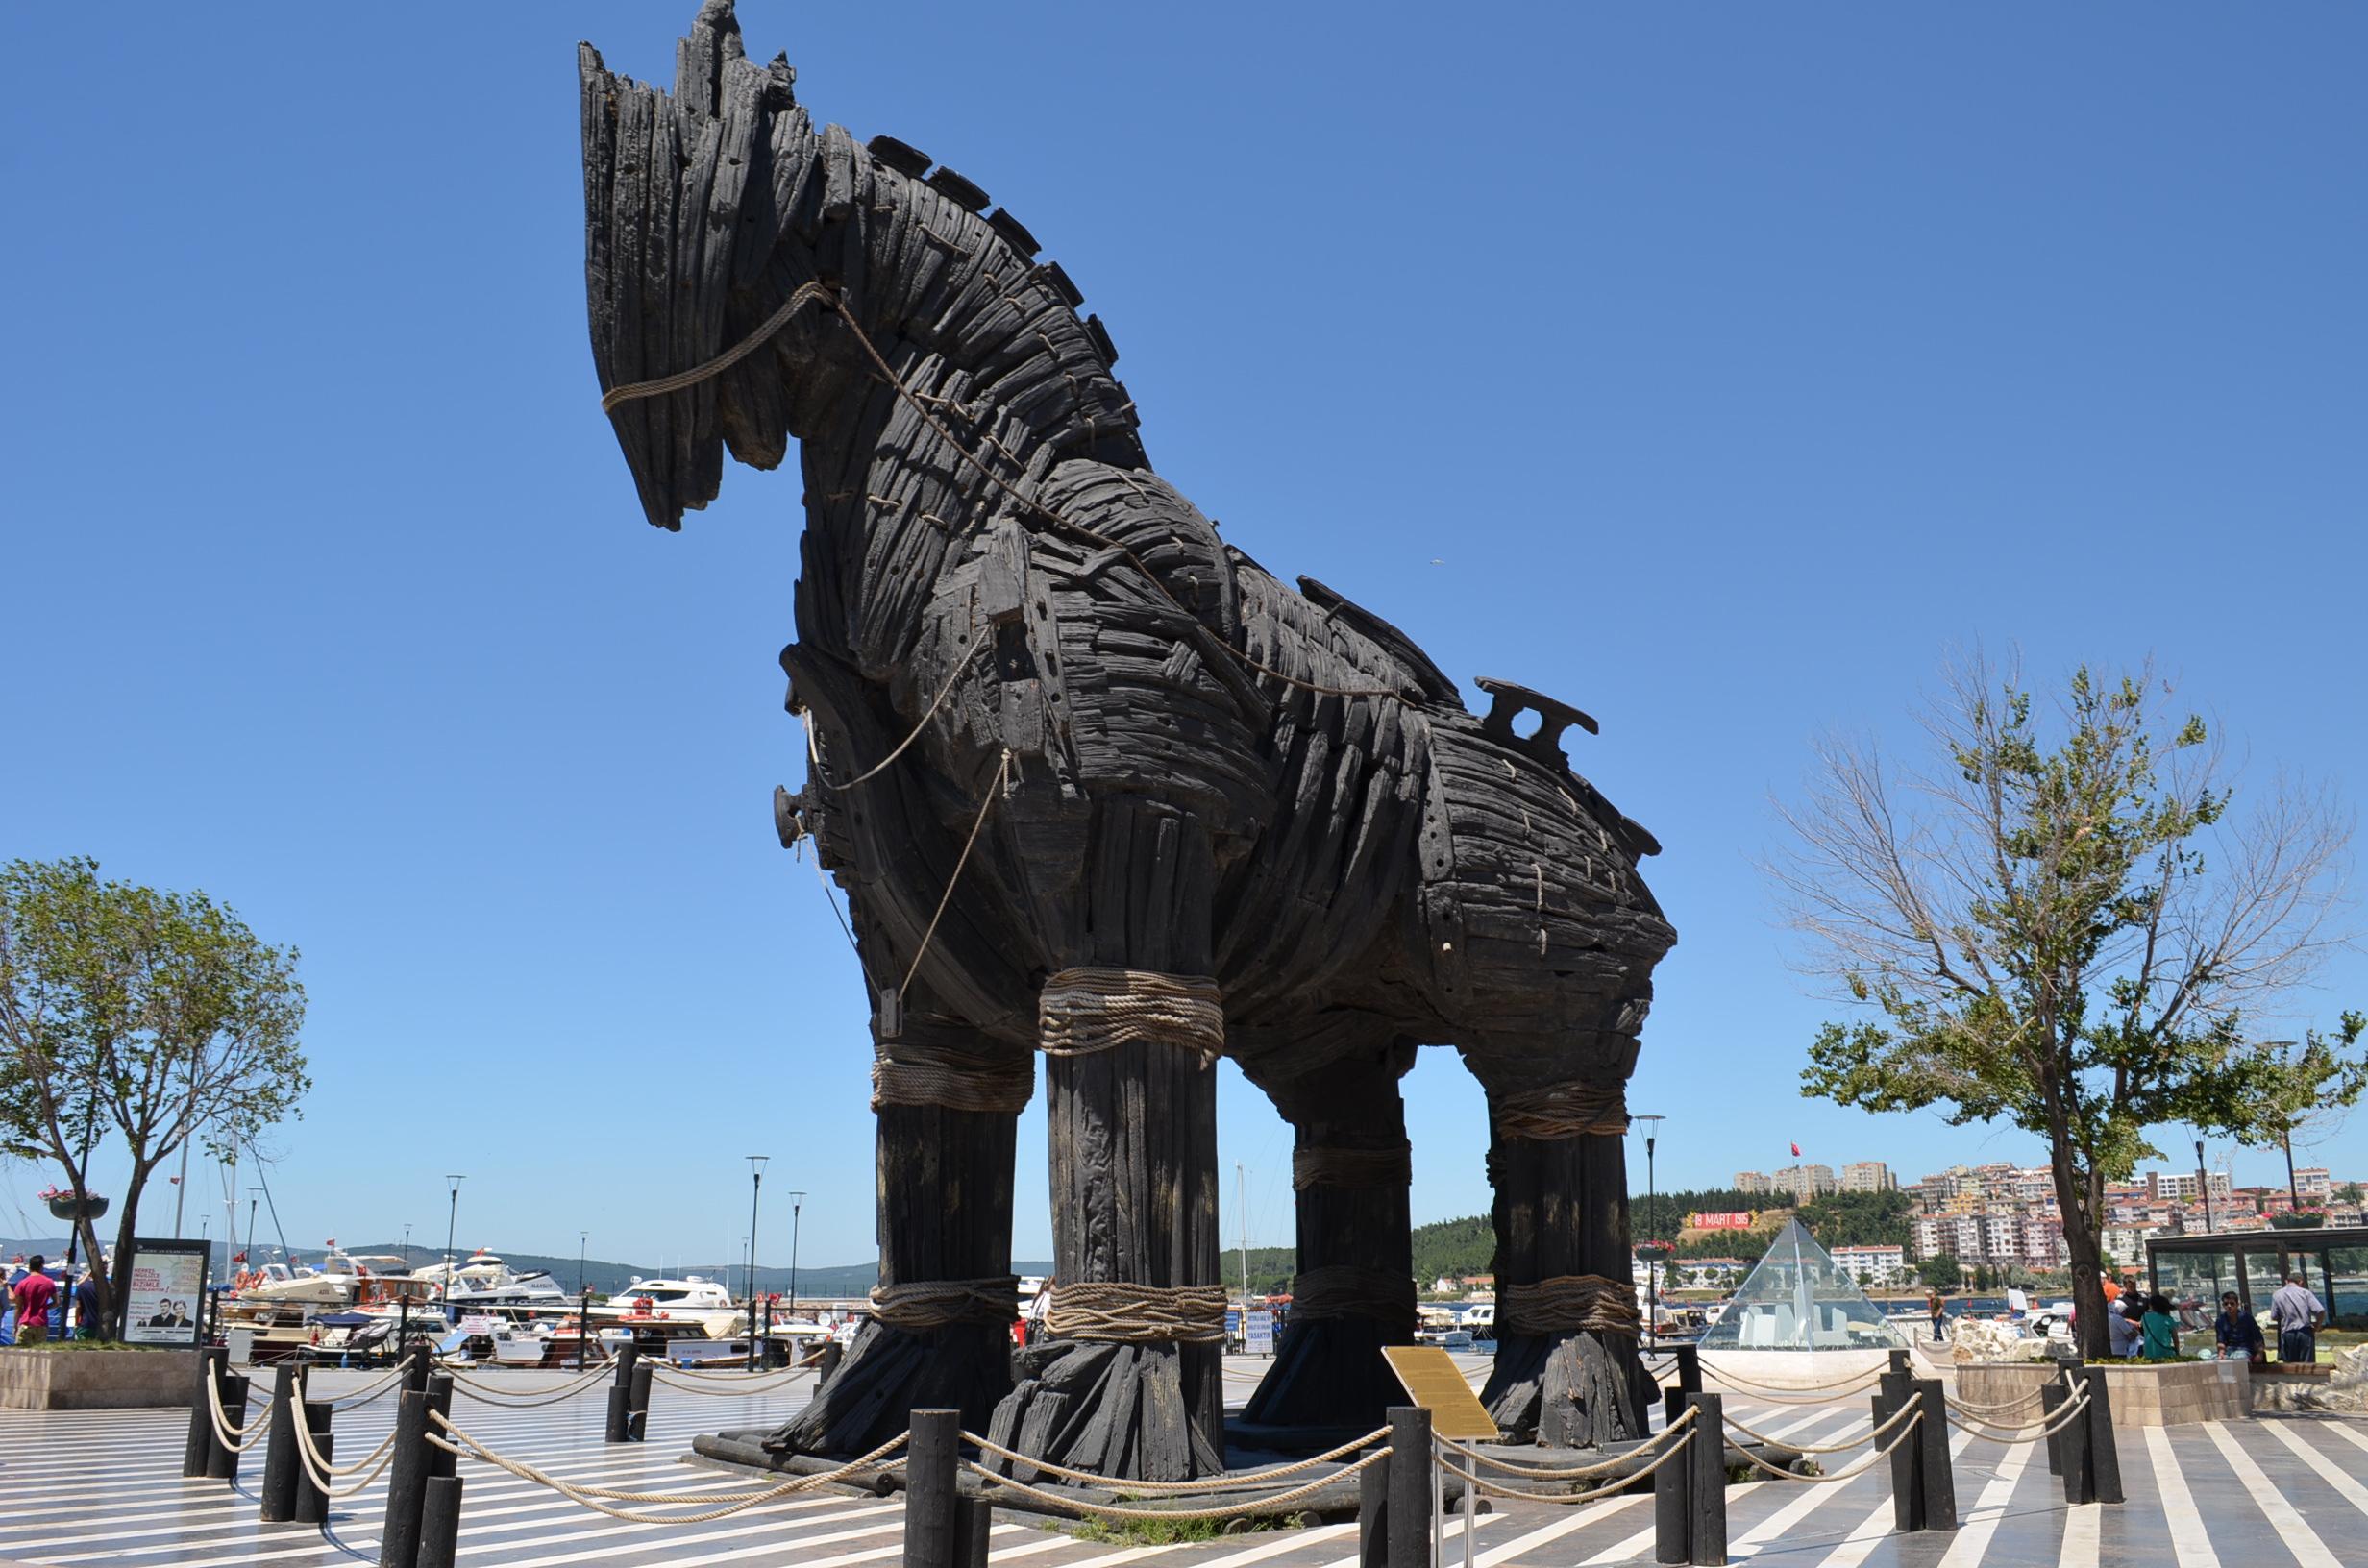 Chapel speaker terms Calvinism 'Trojan Horse'